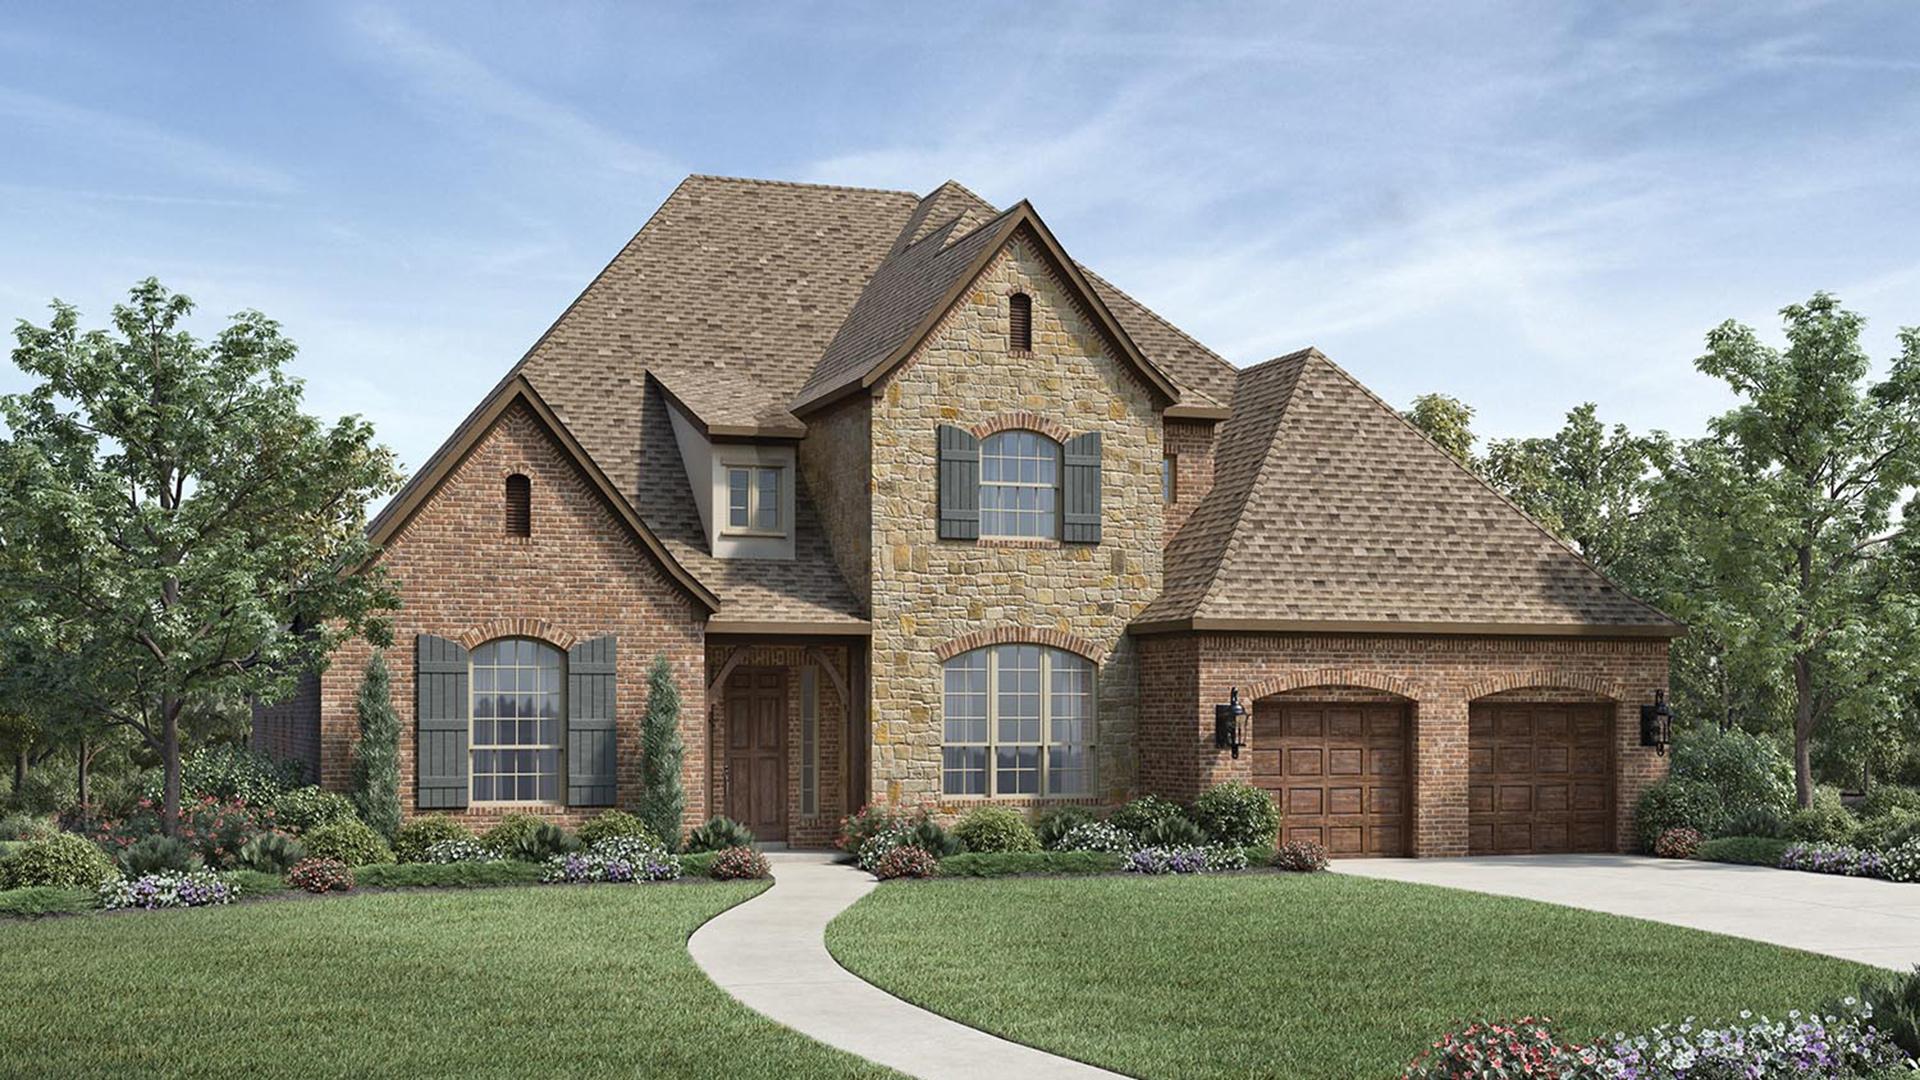 Missouri City TX New Homes for Sale | Sienna Plantation ...